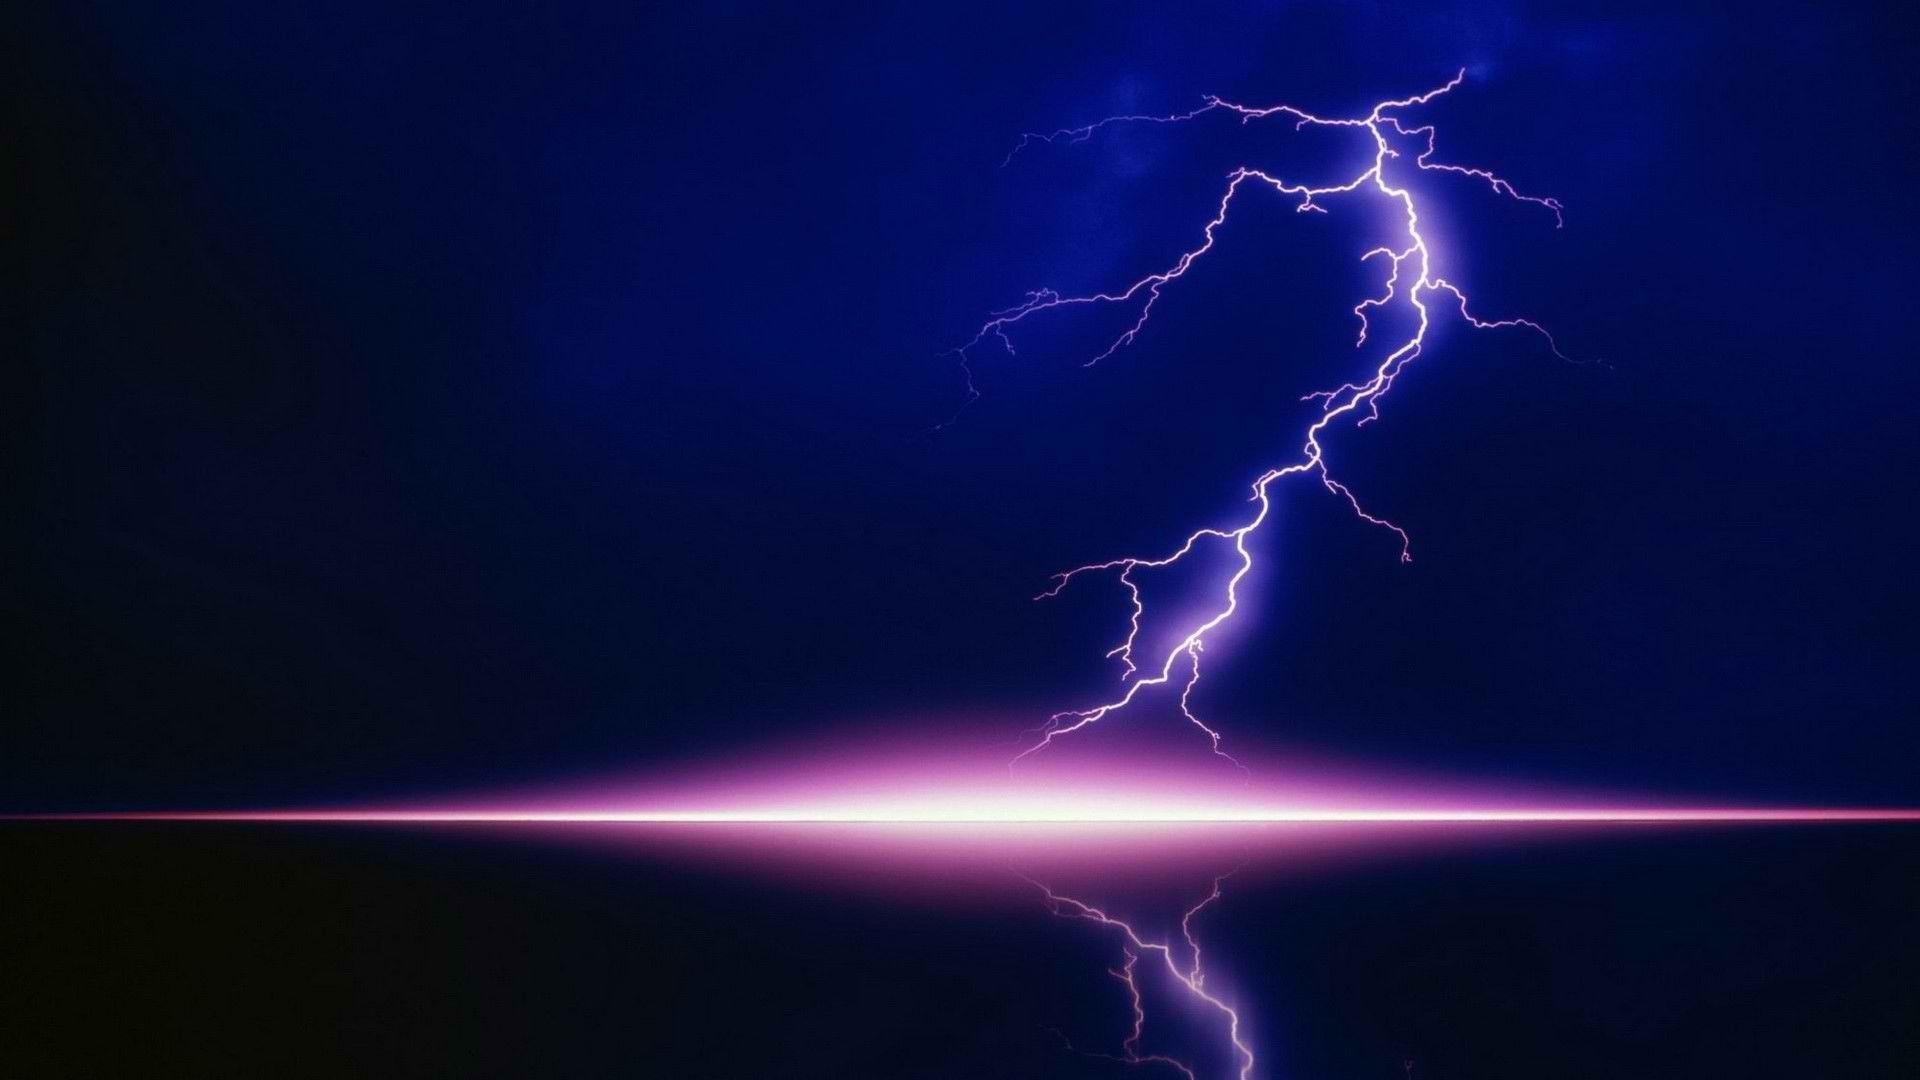 purple lightning wallpaper wallpapersafari